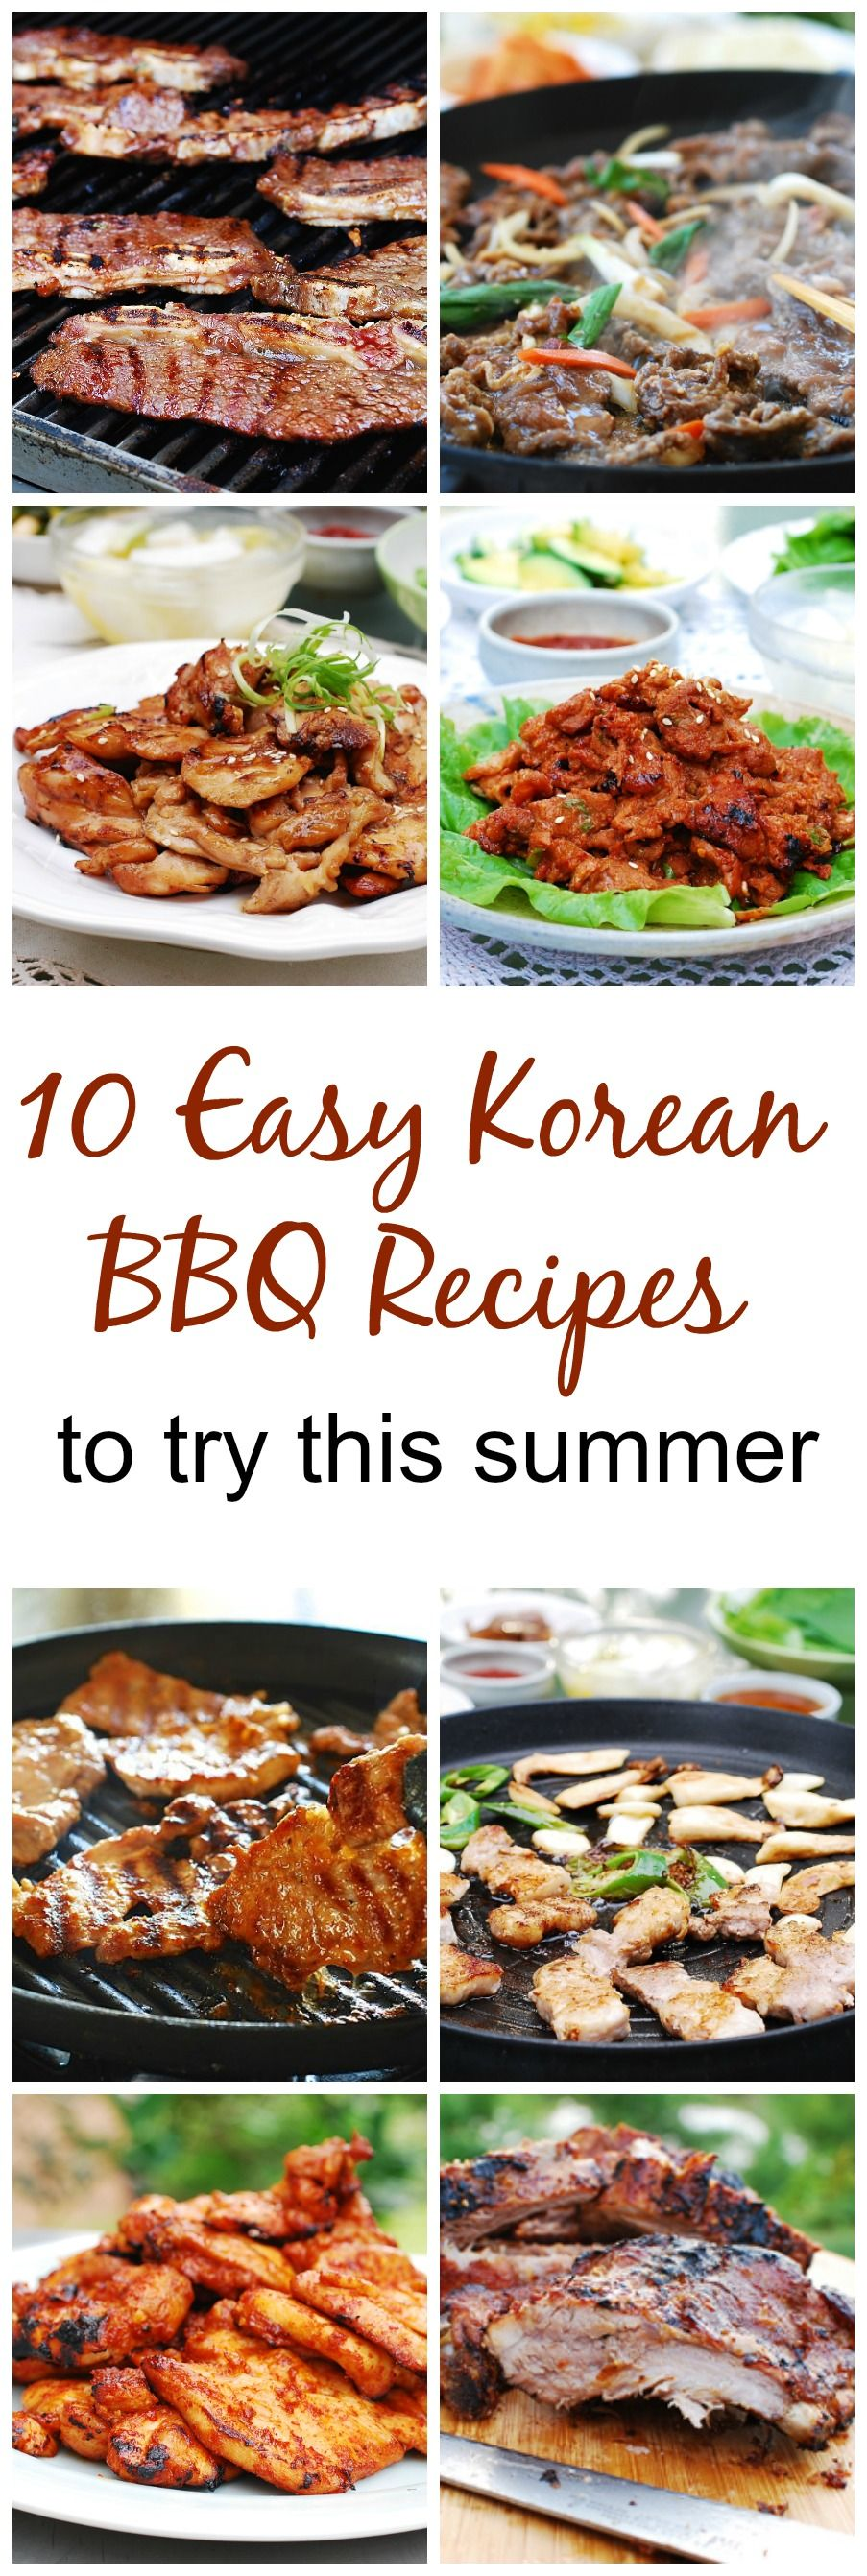 10 easy korean bbq recipes yummy tummy pinterest korean bbq 10 easy korean bbq recipes forumfinder Choice Image